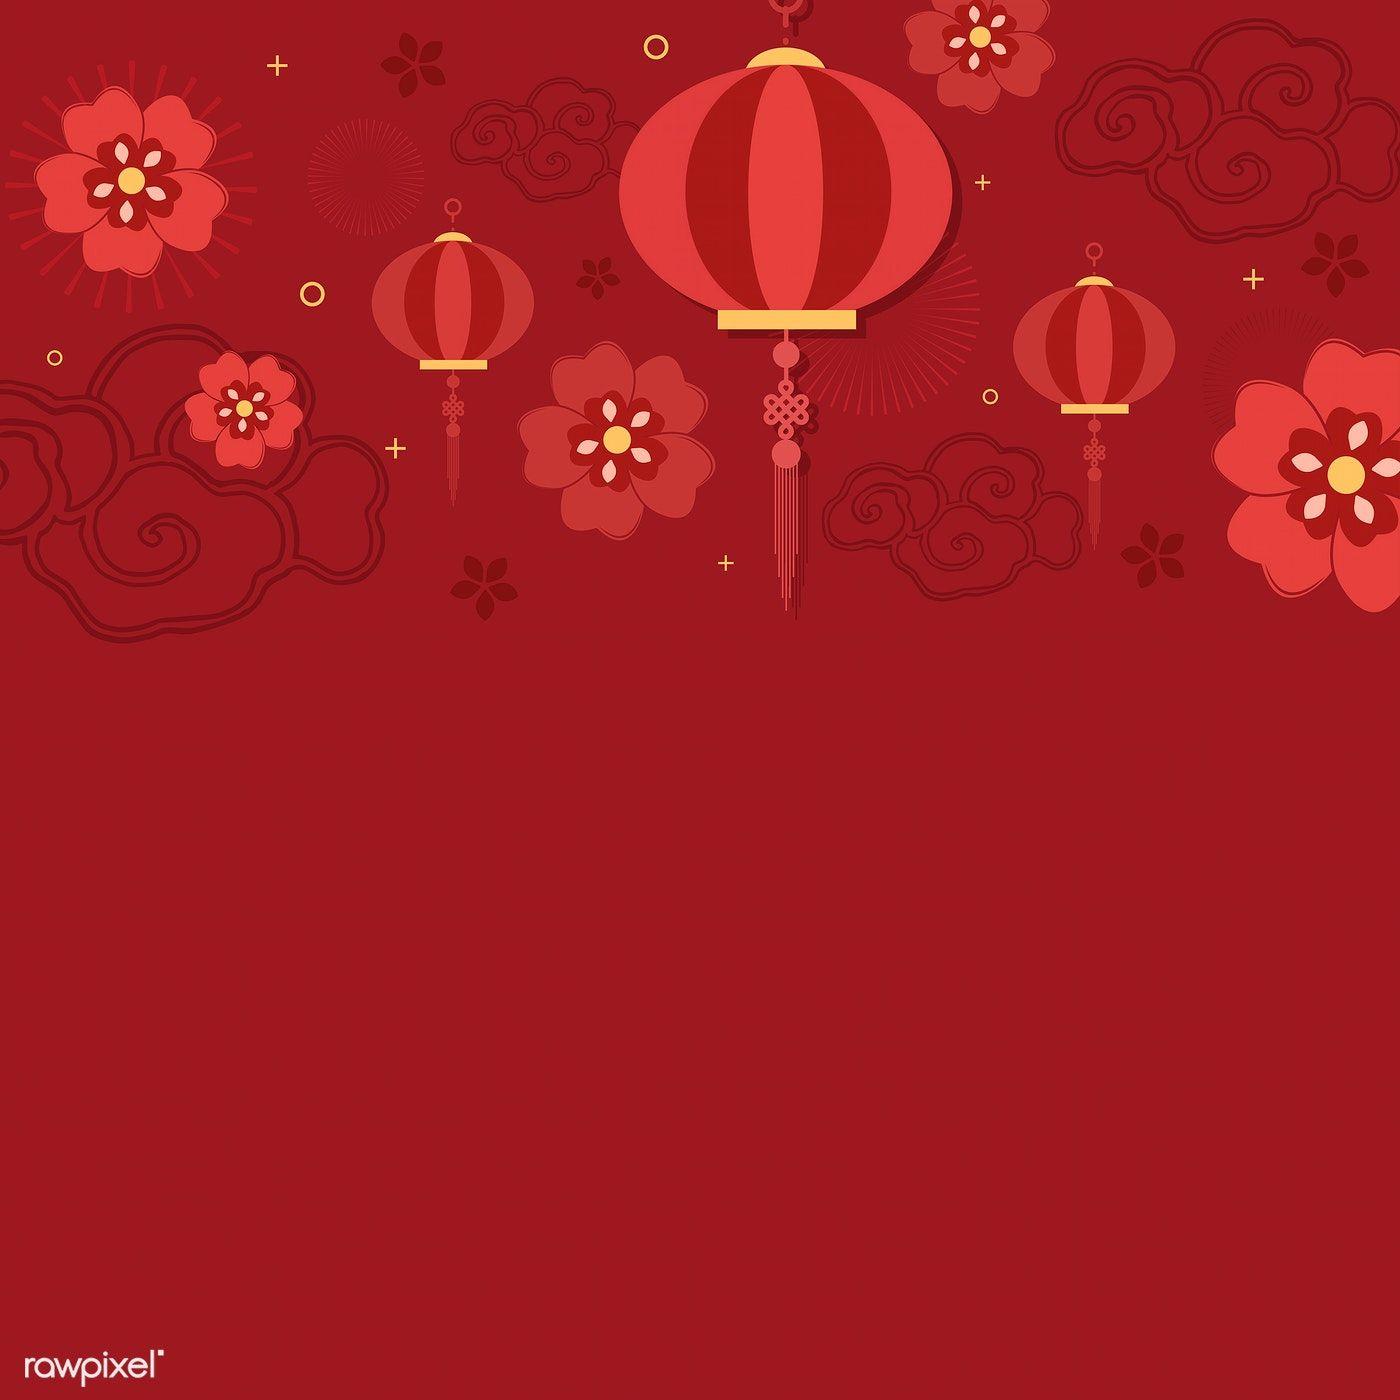 Chinese New Year 2019 Greeting Background Free Image By Rawpixel Com Kappy Kappy Chinese New Year Background New Years Background Chinese New Year